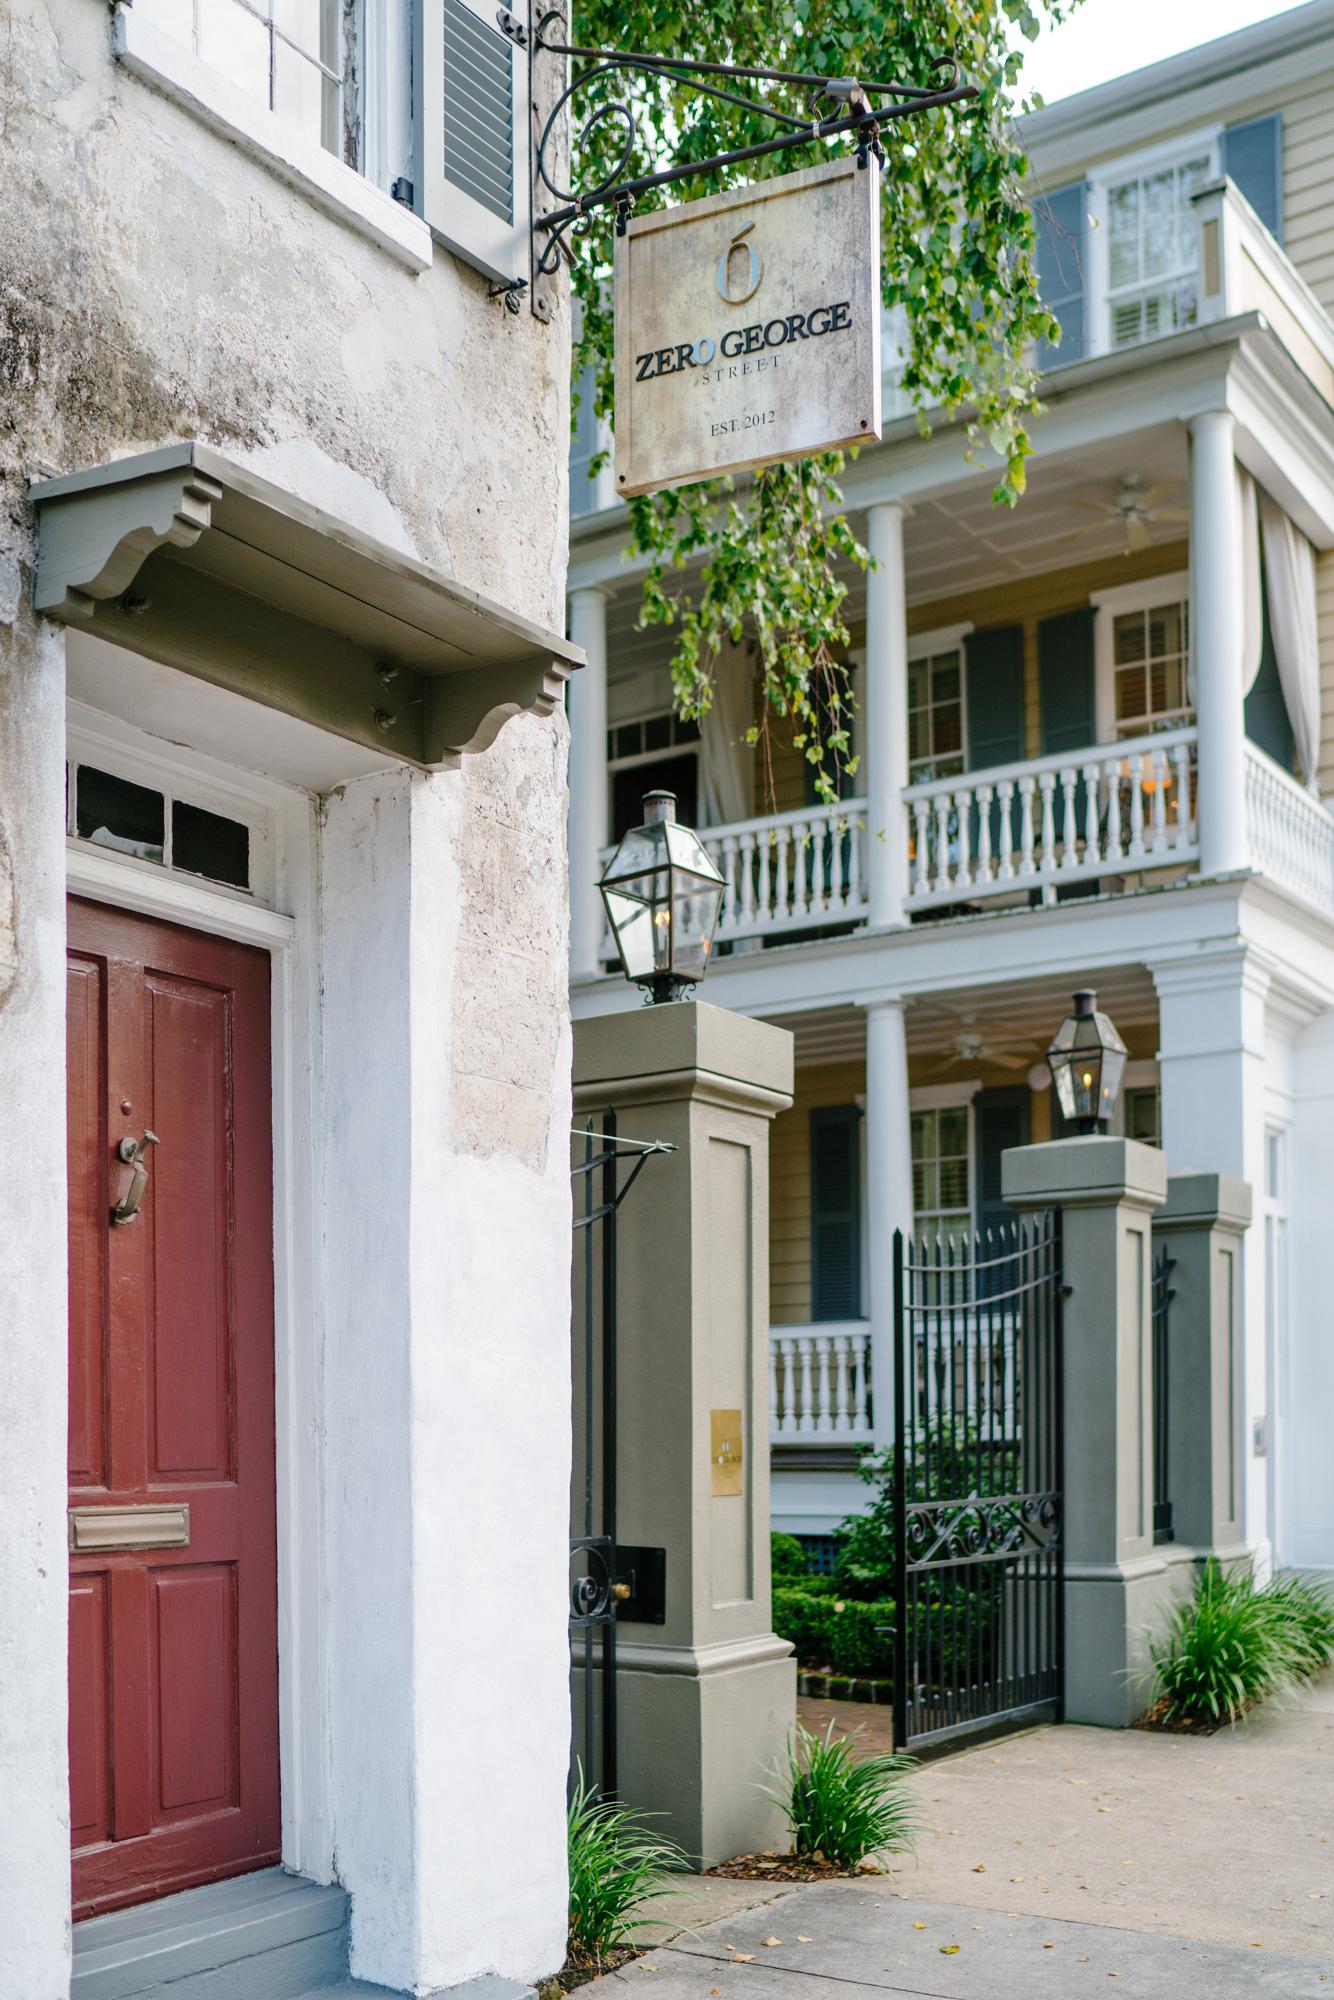 Zero George Street in Charleston | Never Settle Travel